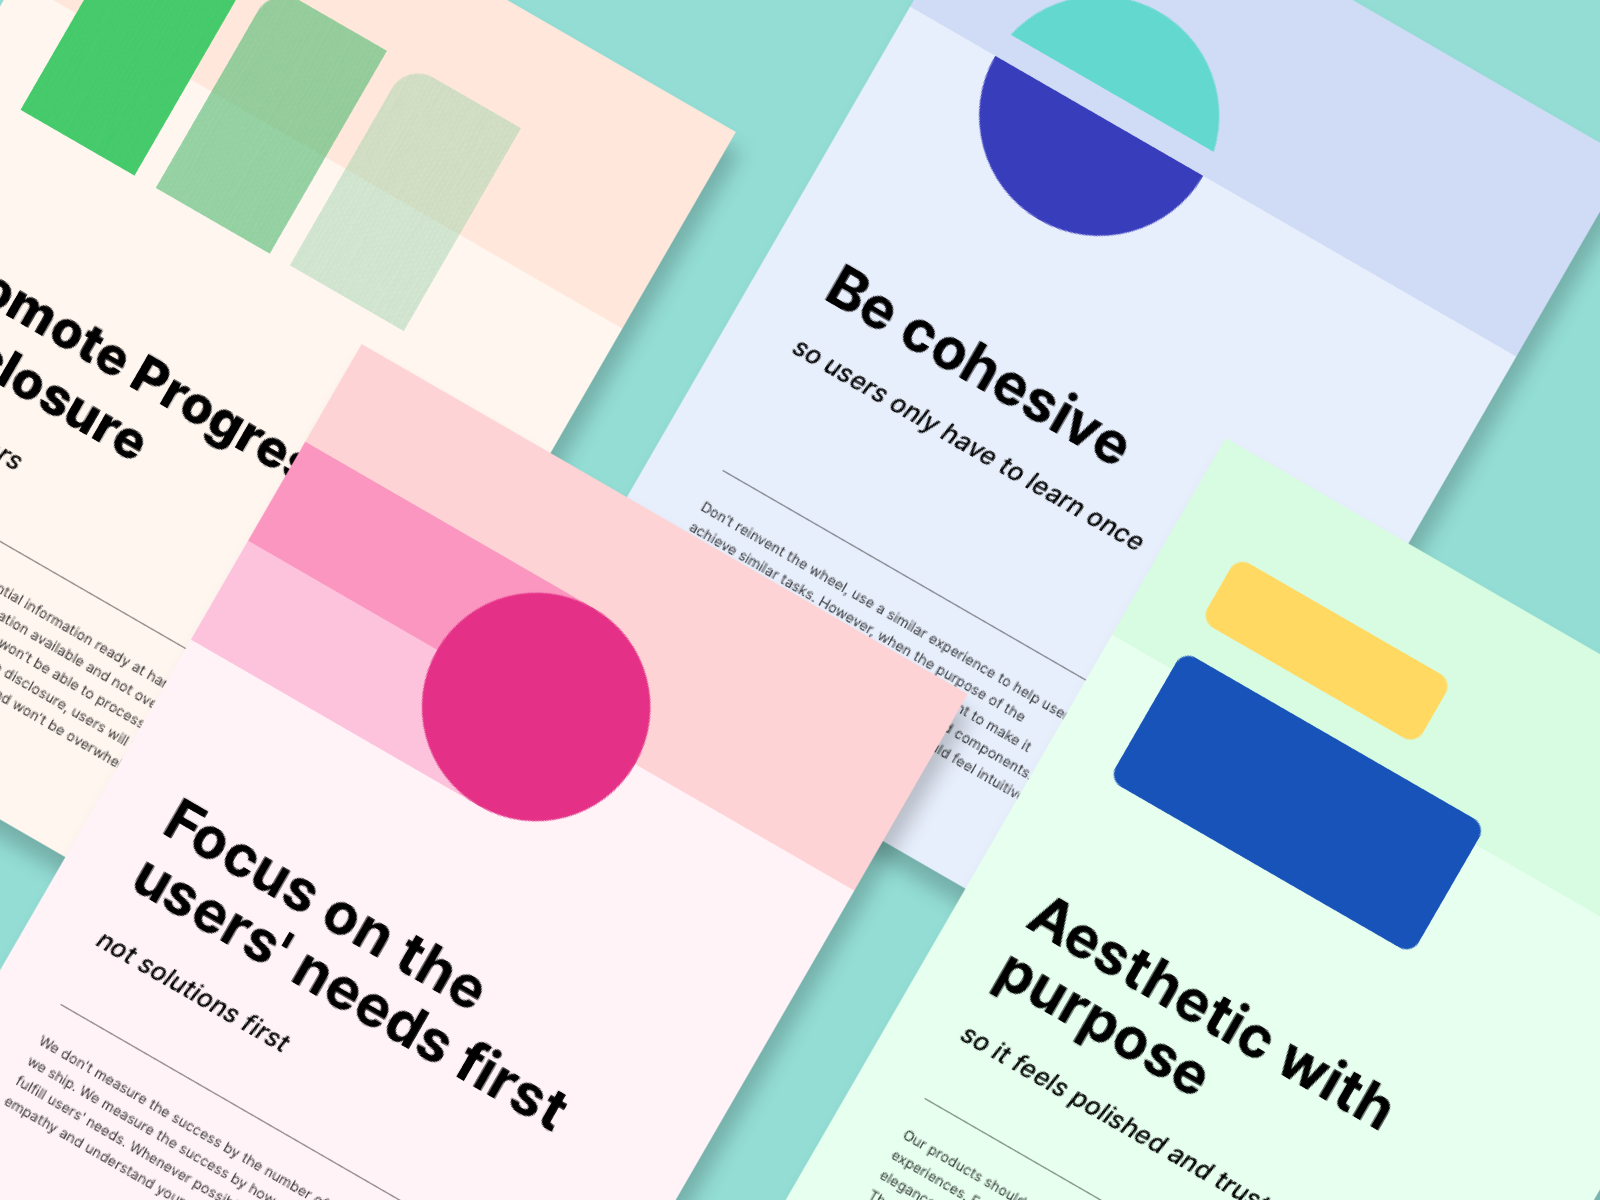 Bukalapak principles poster collage